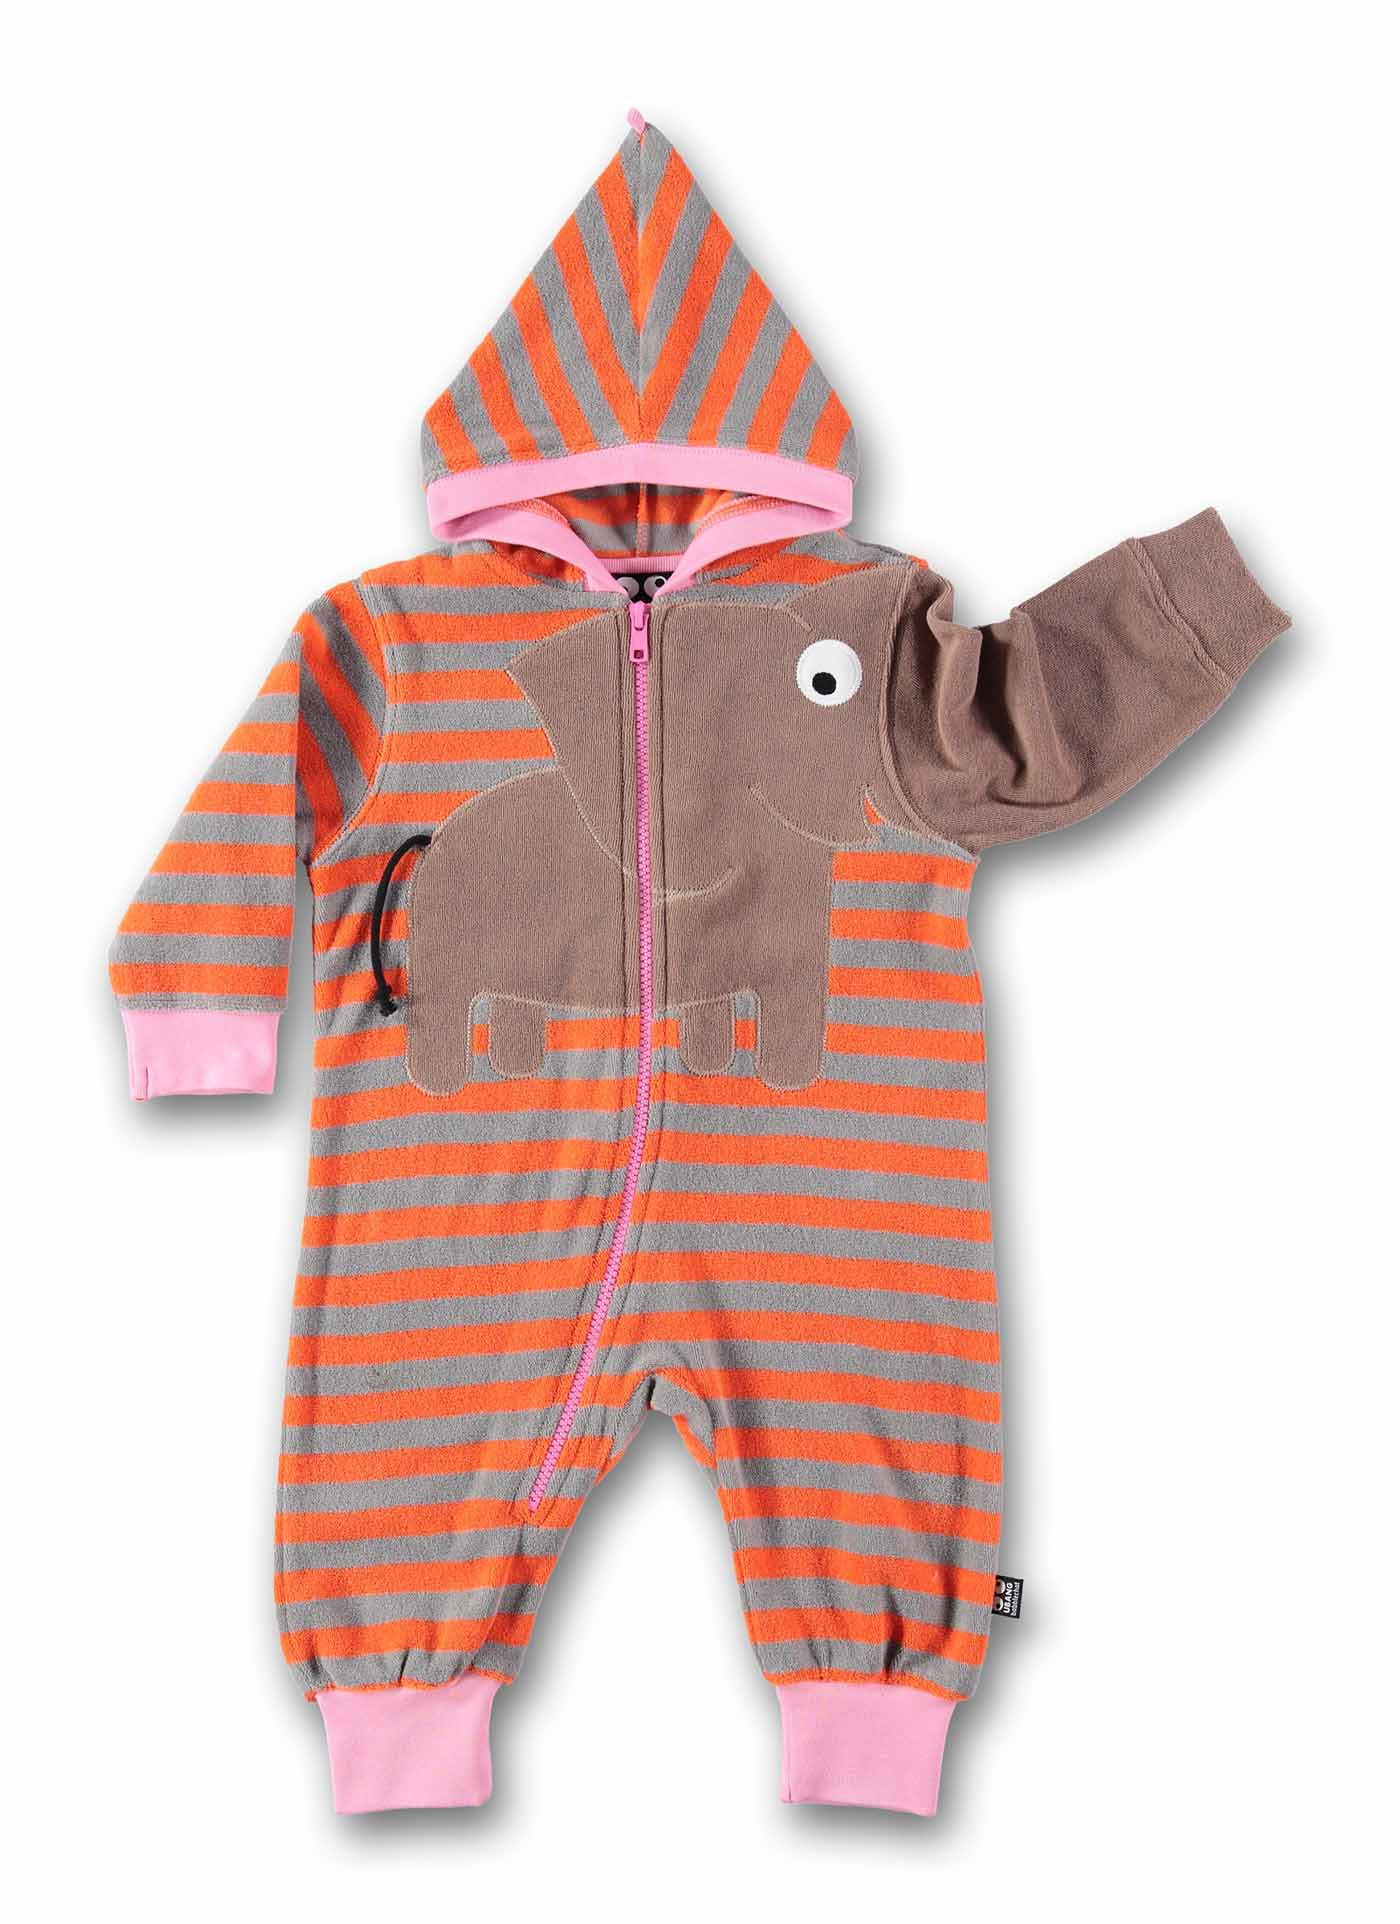 Ubang babblechat baby Overall Anzug Einteiler Elefant orange grau 74 80 86 92